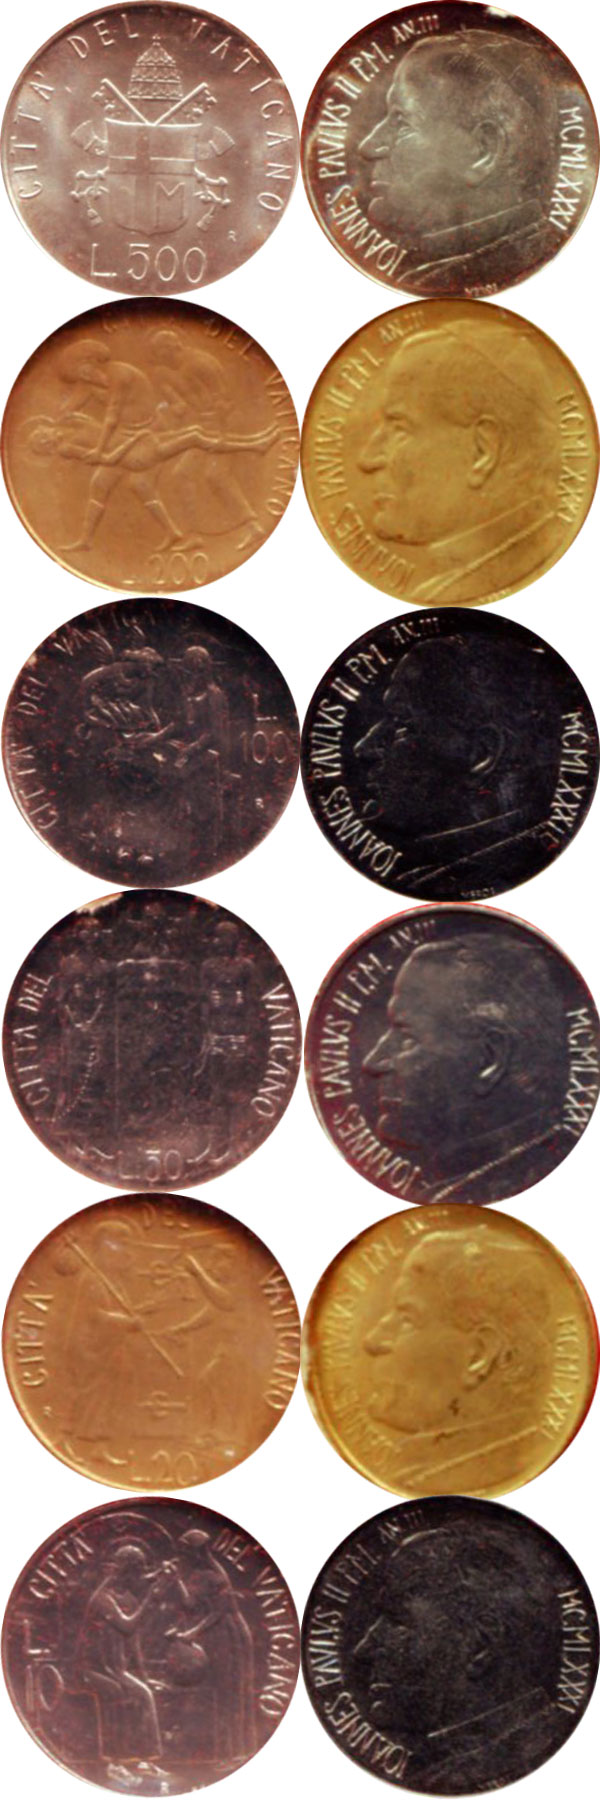 Картинка Подарочные монеты Ватикан Anno III 1981  1981